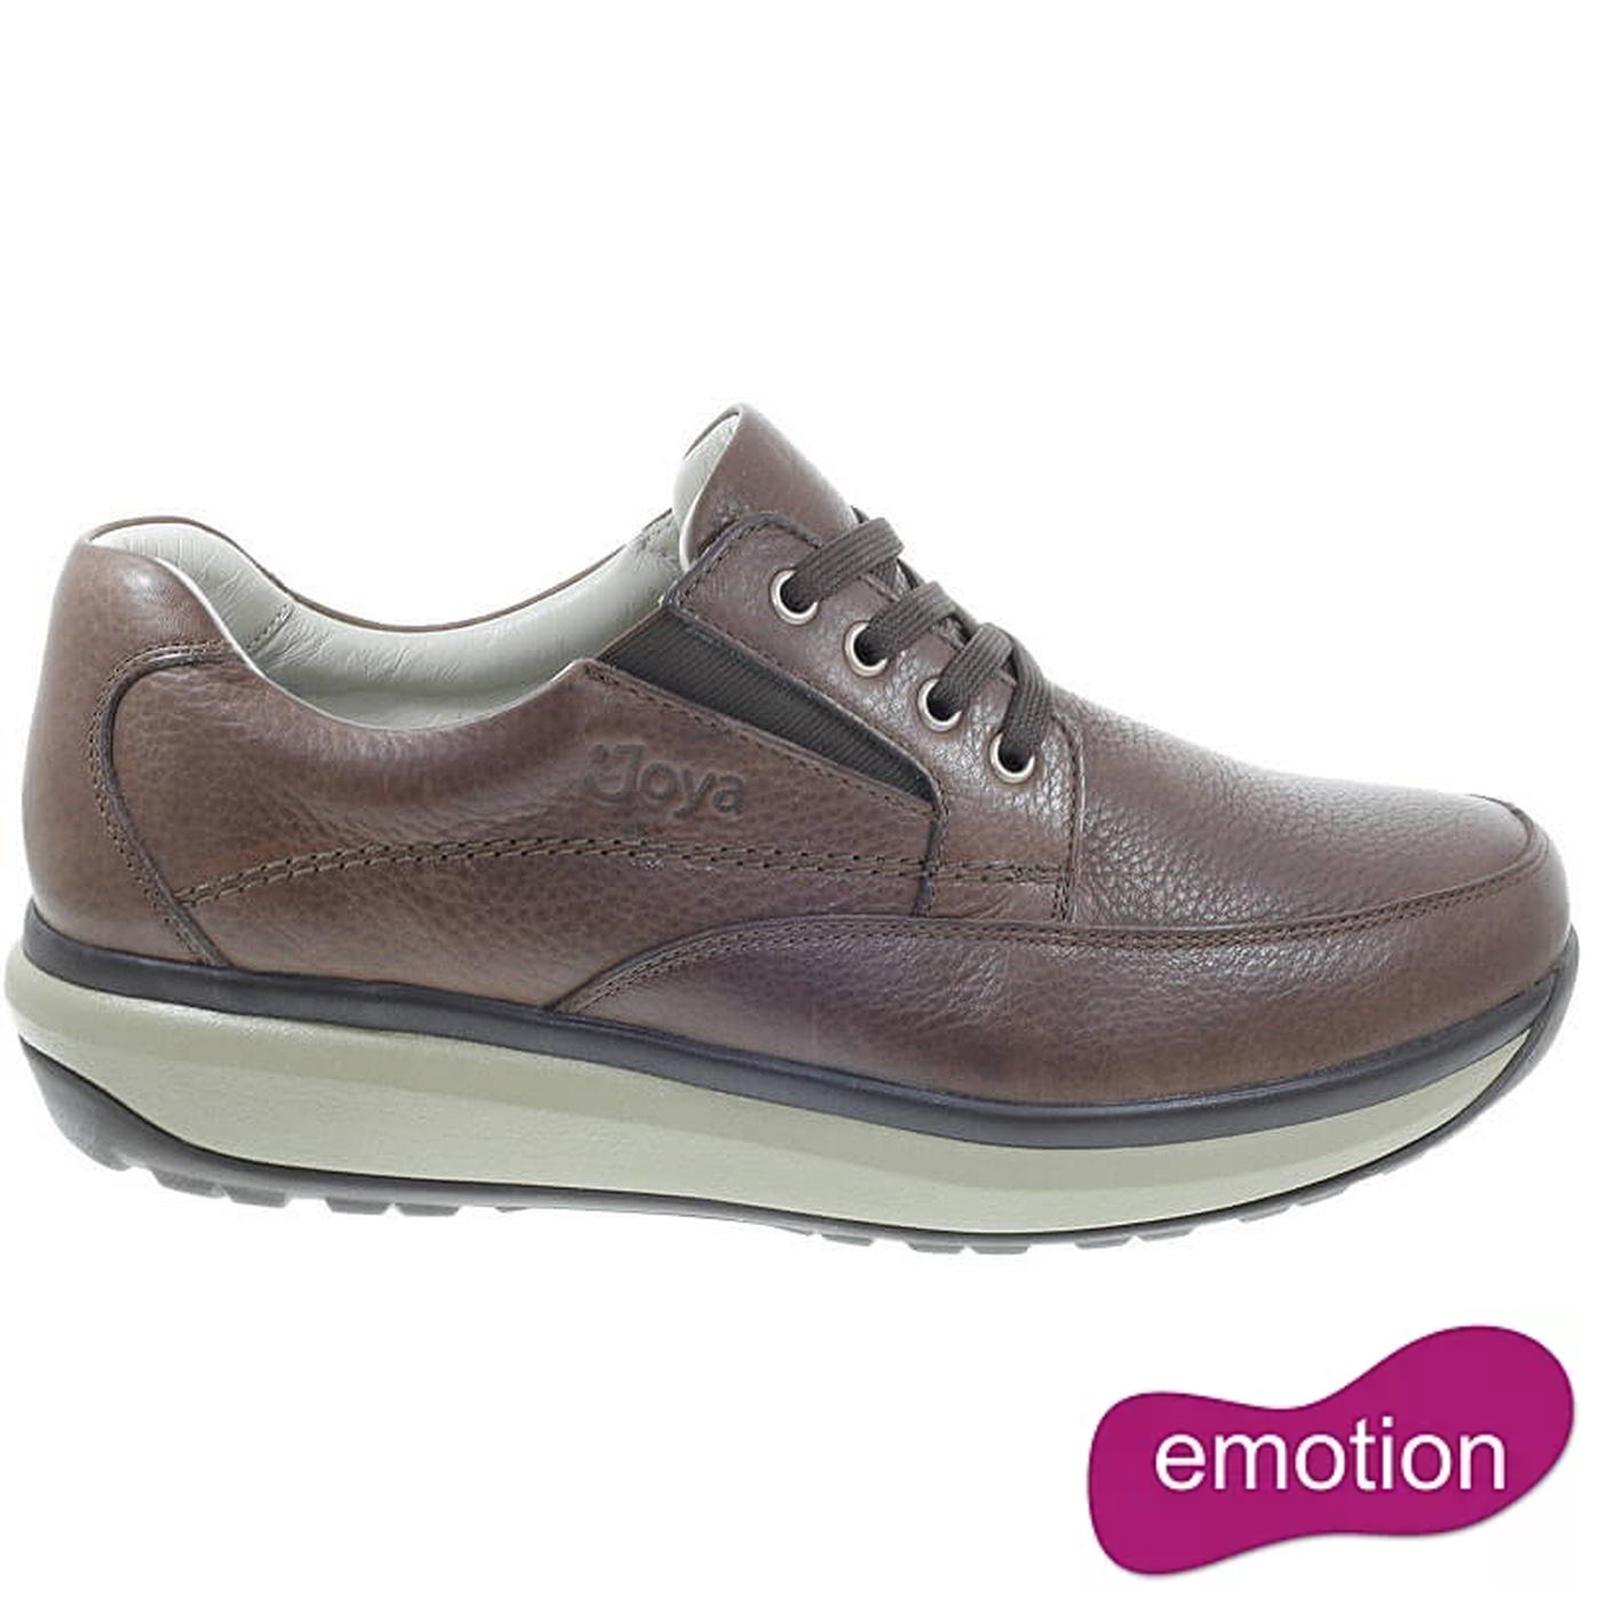 Joya Mens Cruiser II Leather Shoes - Brown